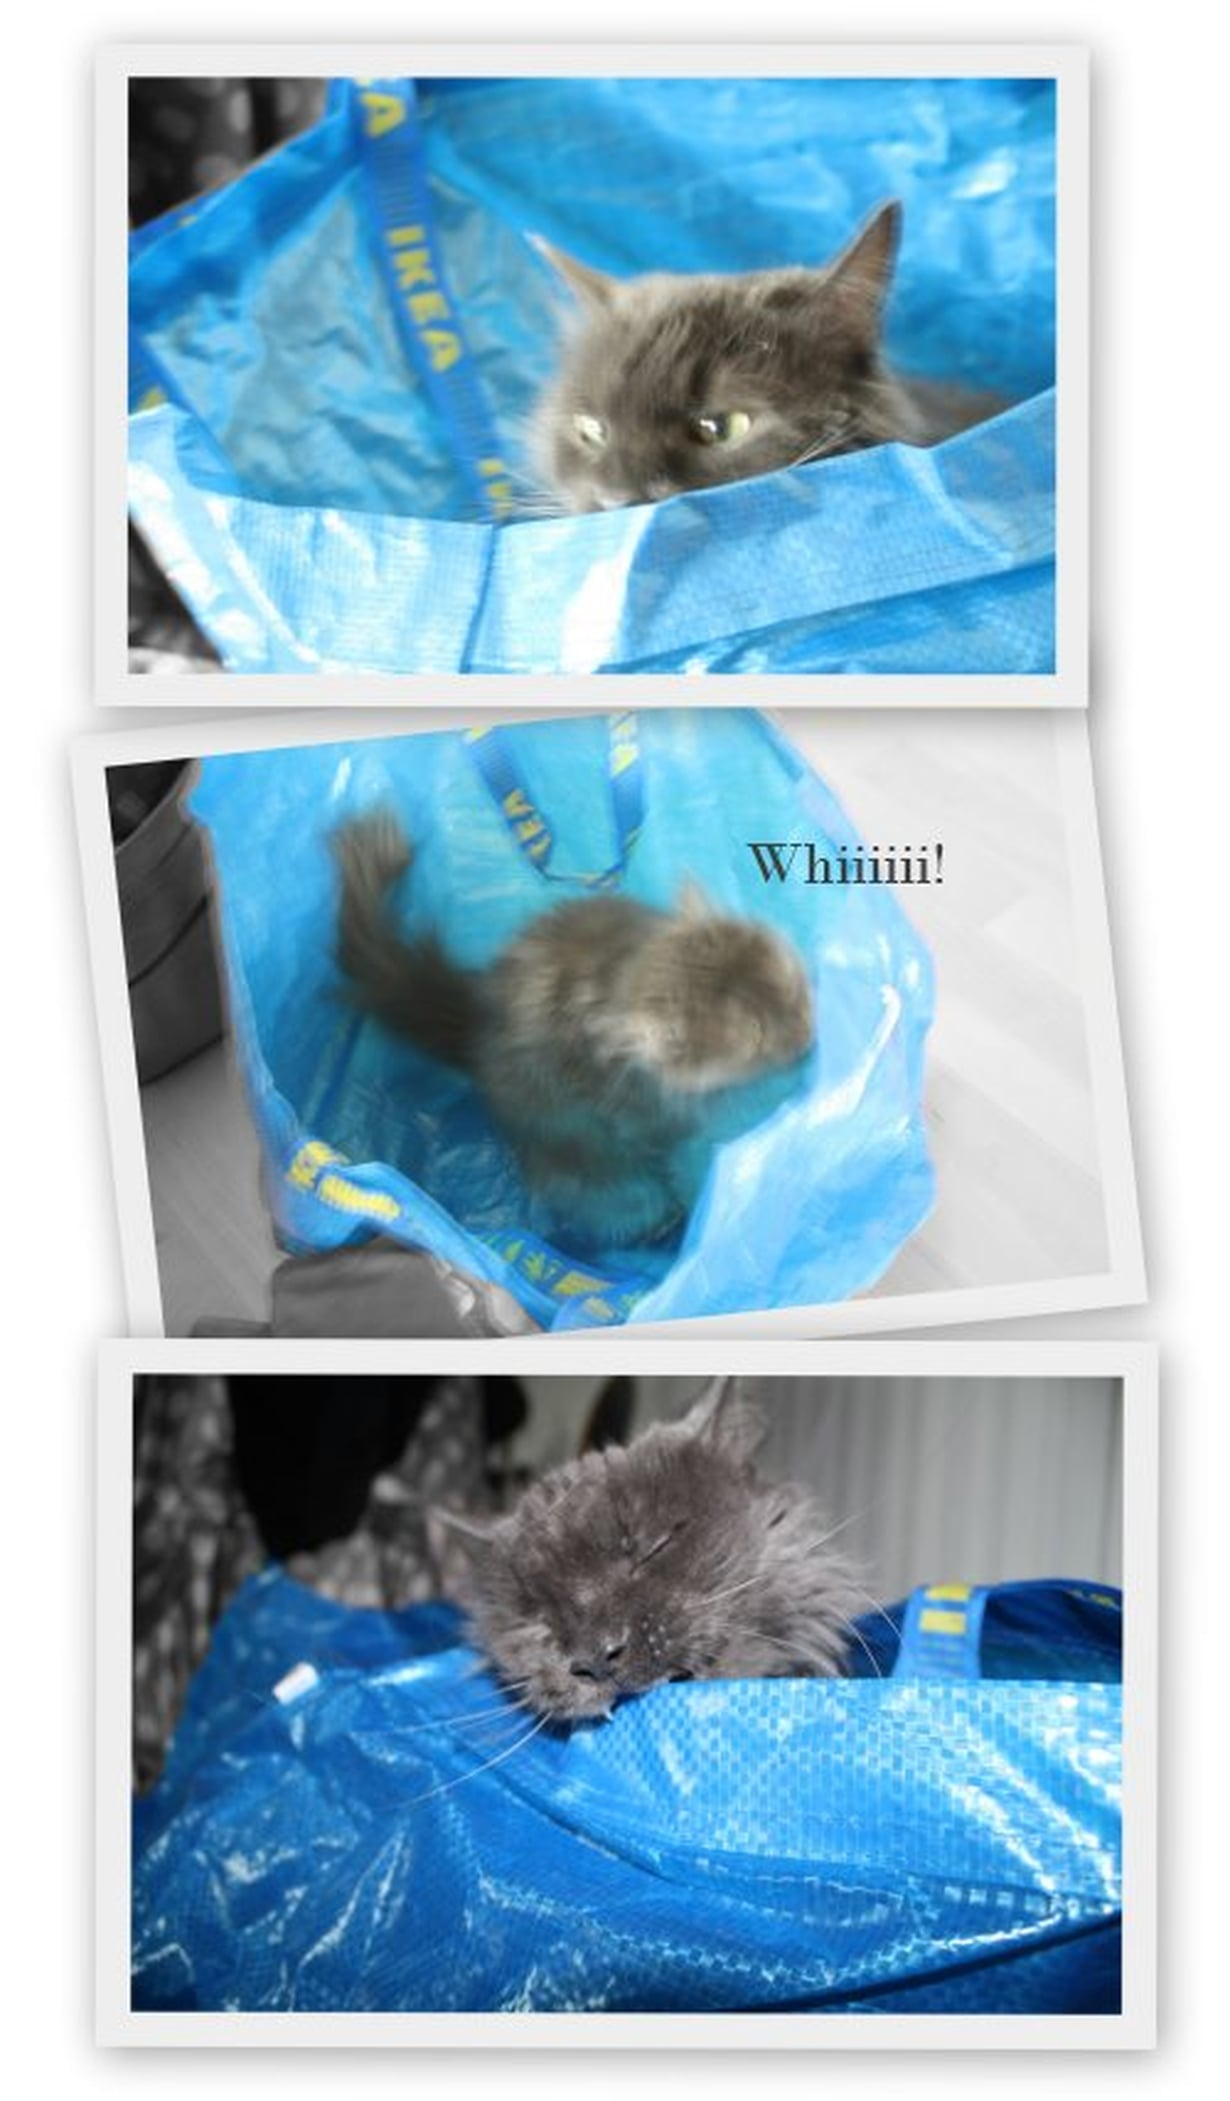 nöpö kissa